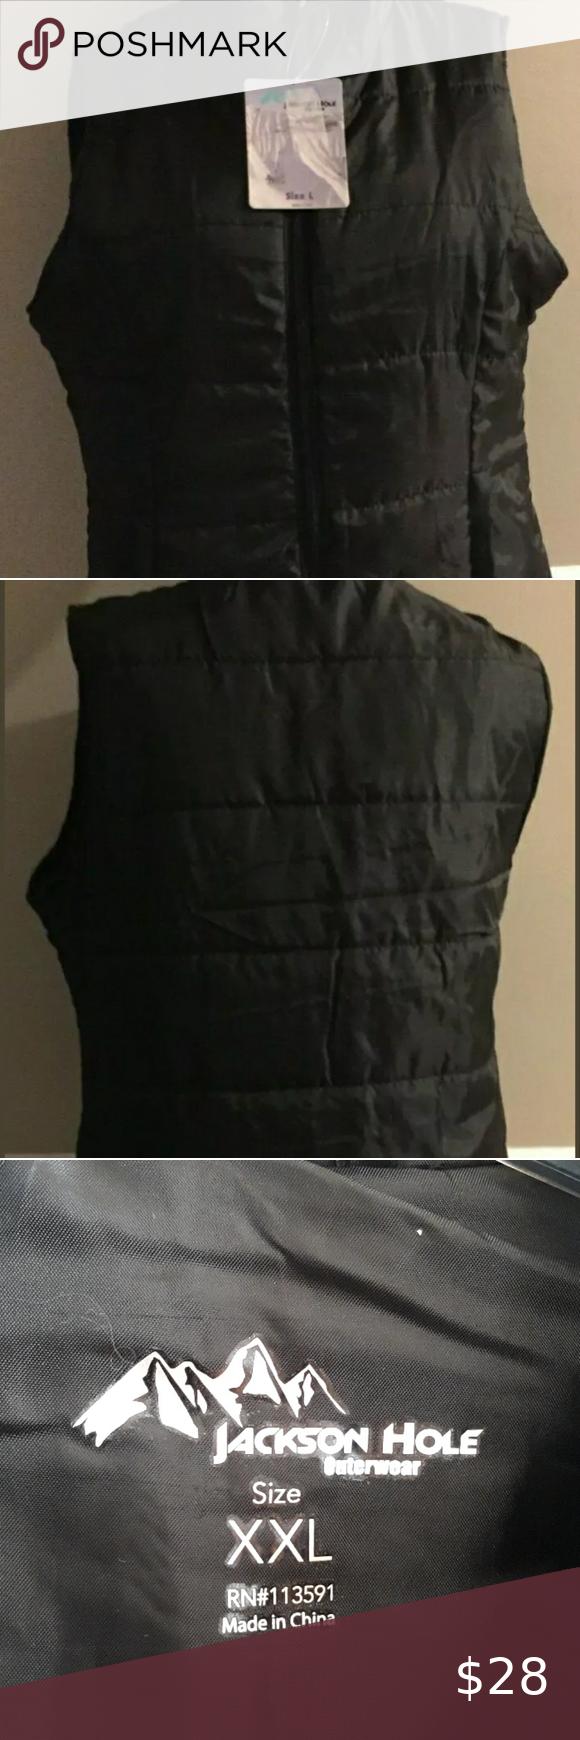 Jackson Hole Womens Black Puffer Vest Size Xxl Womens Black Puffer Vest Black Puffer Vest Black Puffer [ 1740 x 580 Pixel ]